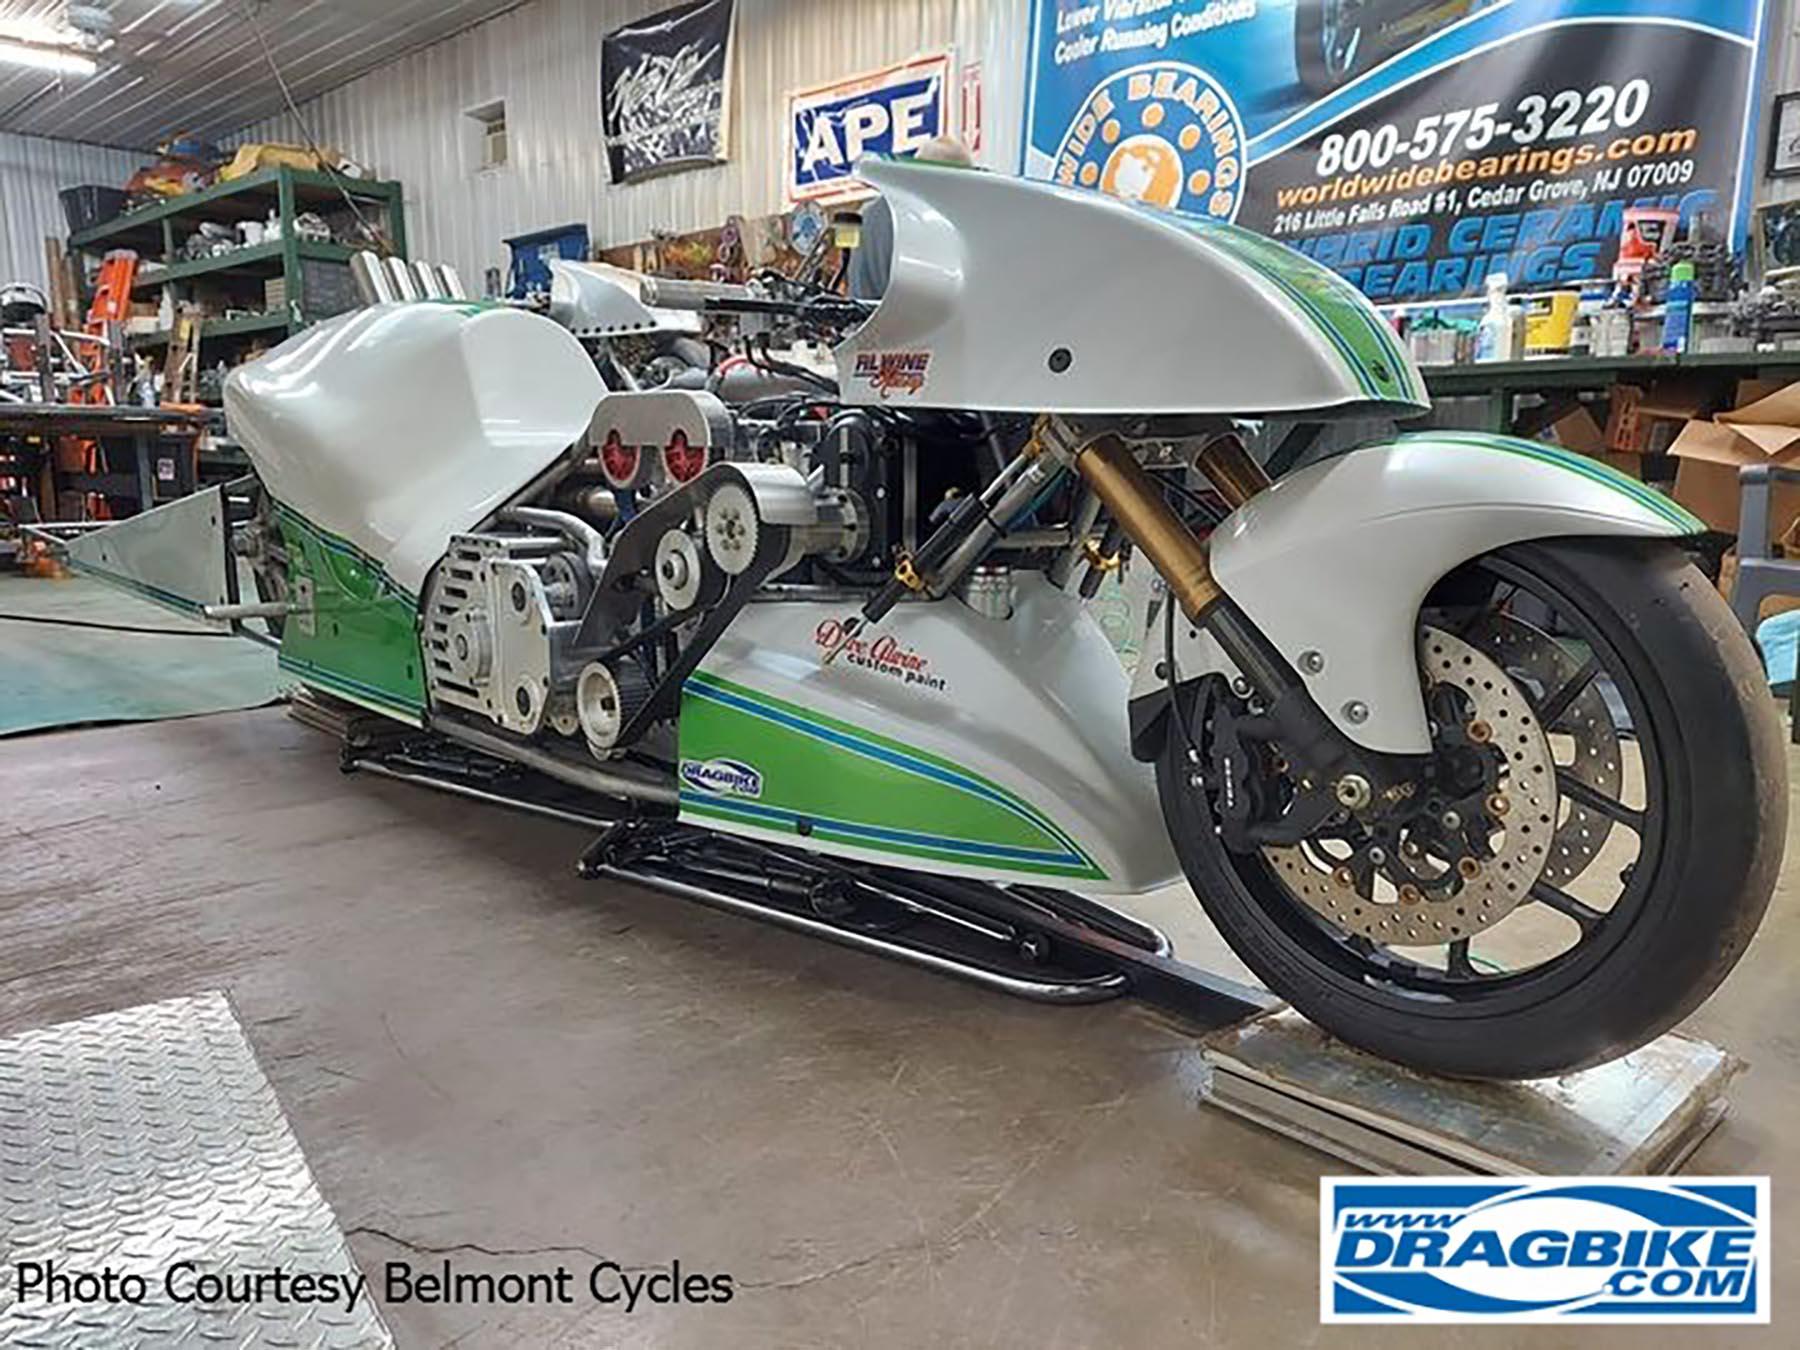 Top Fuel Motorcycle - Micah Fenwick